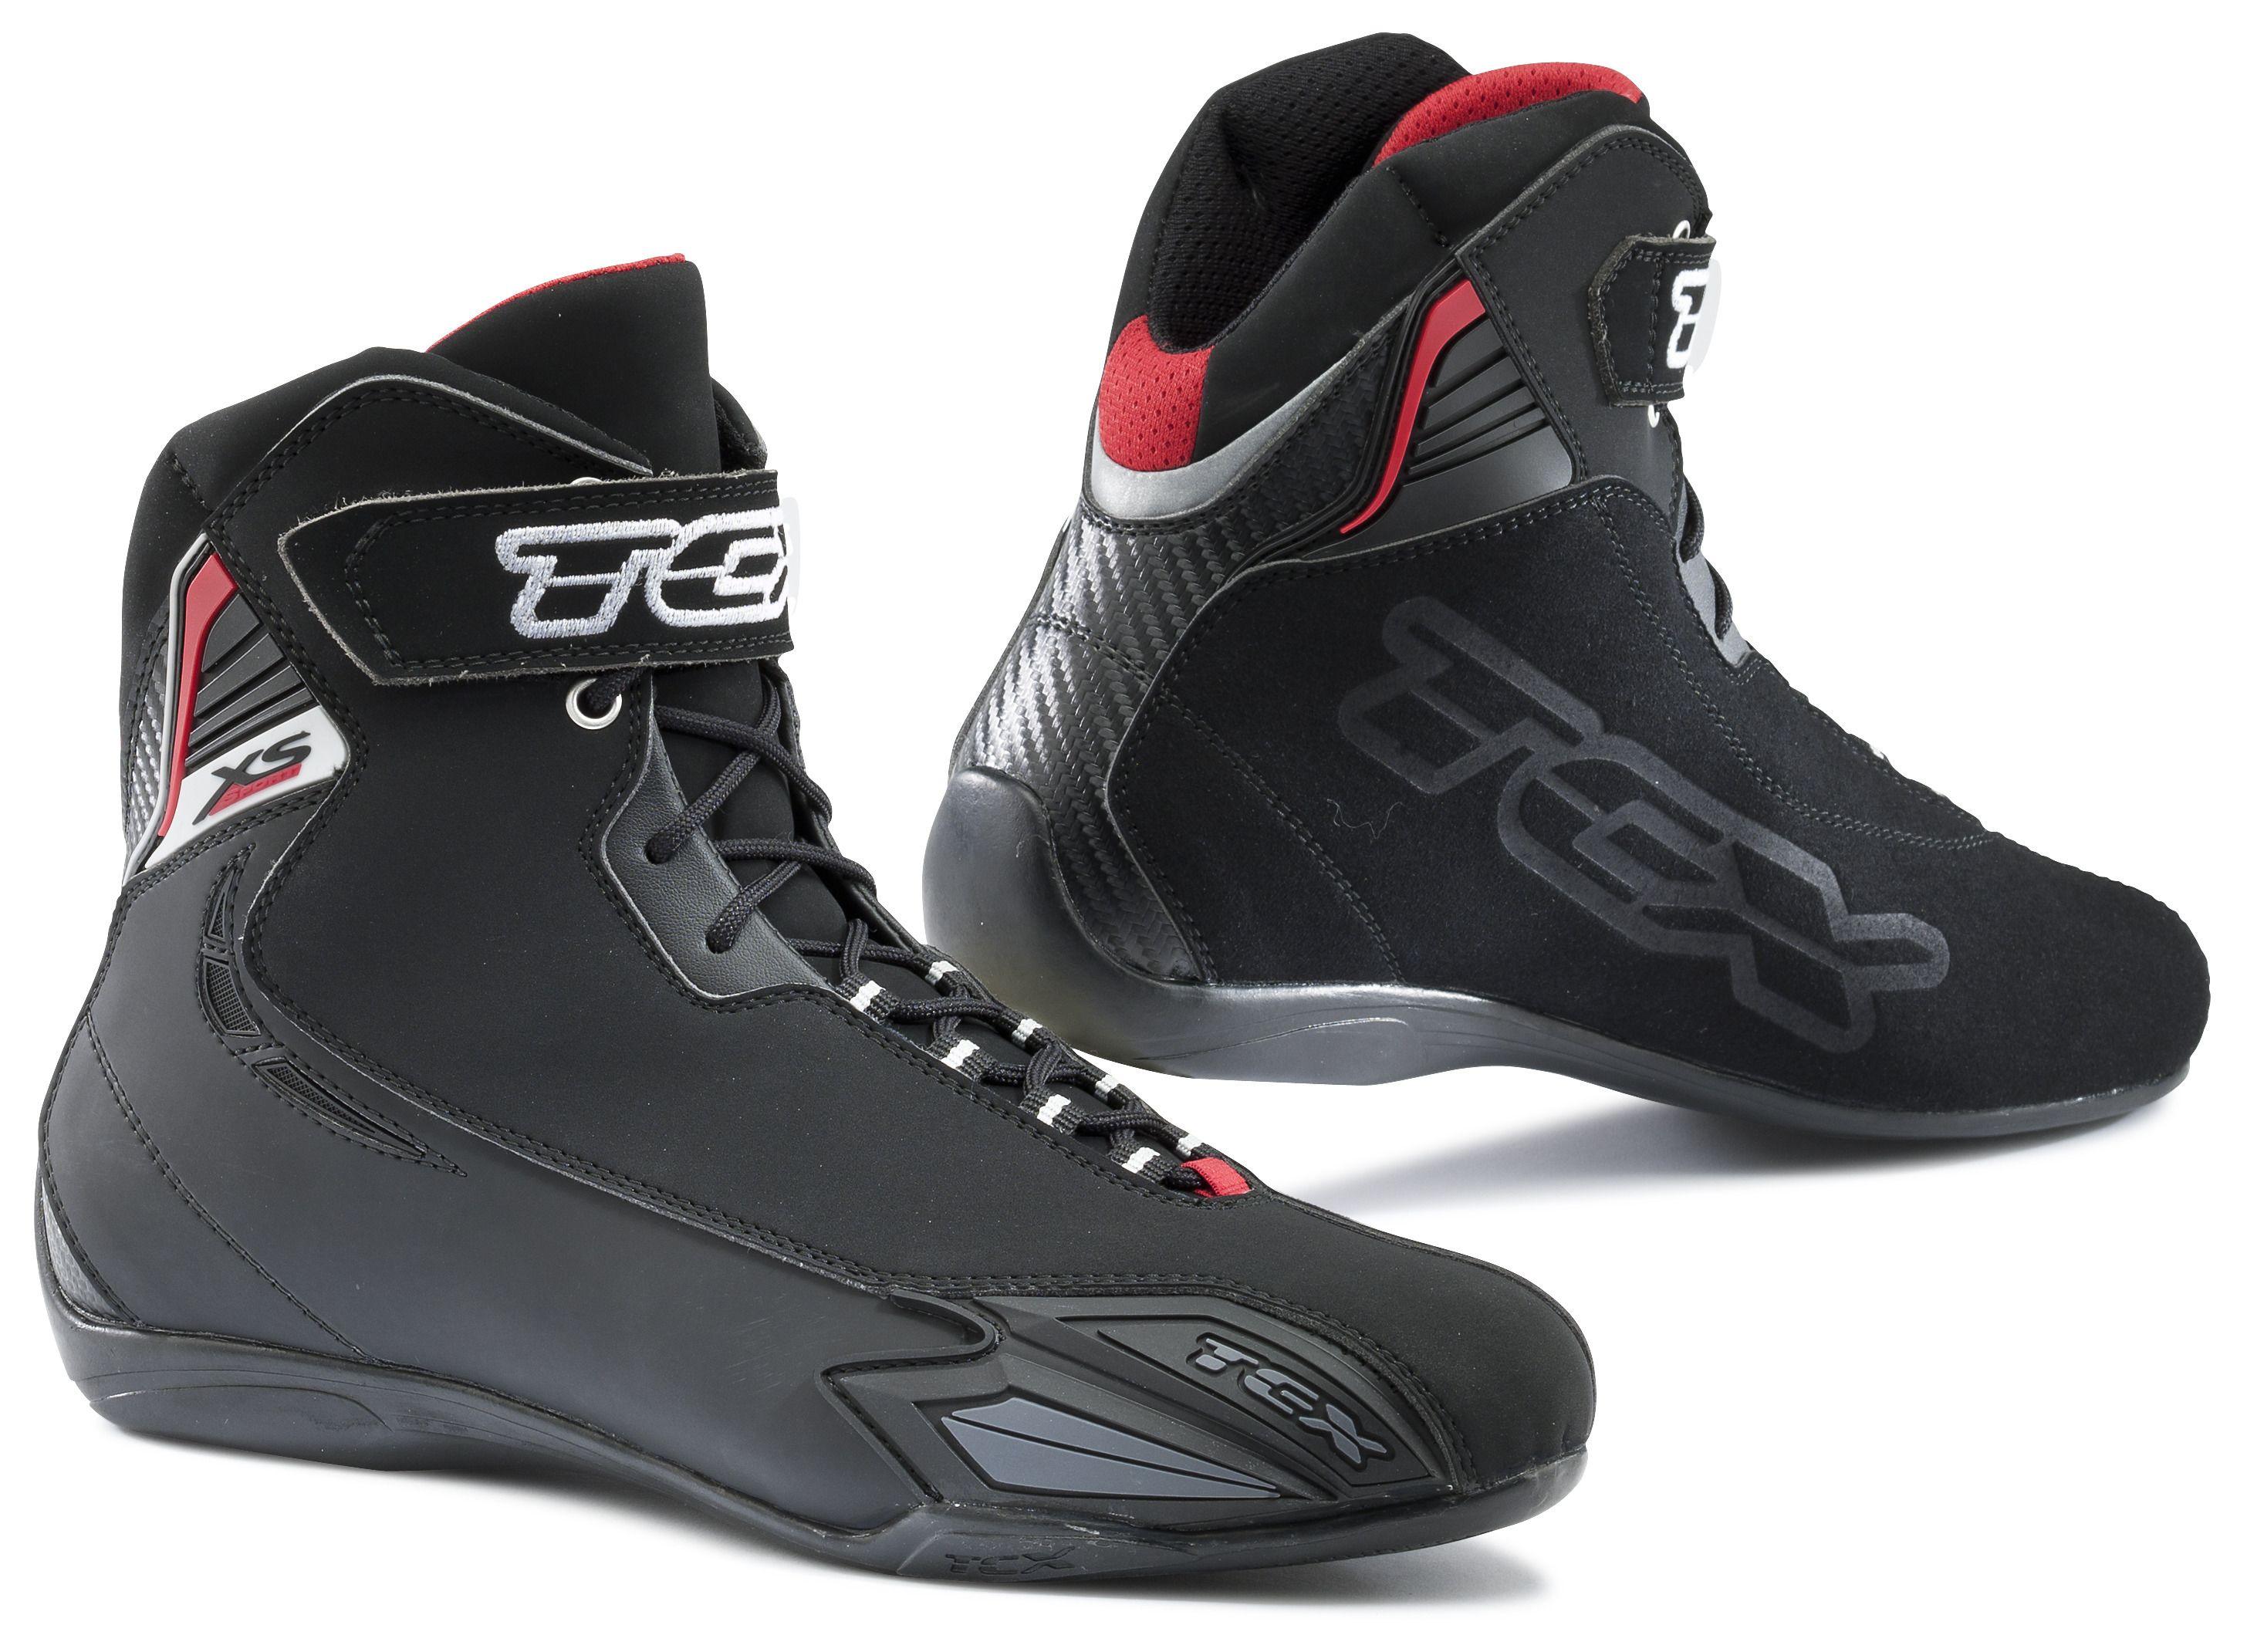 TCX X-Square Sport WP Boots | 60% ($89.99) Off! - RevZilla